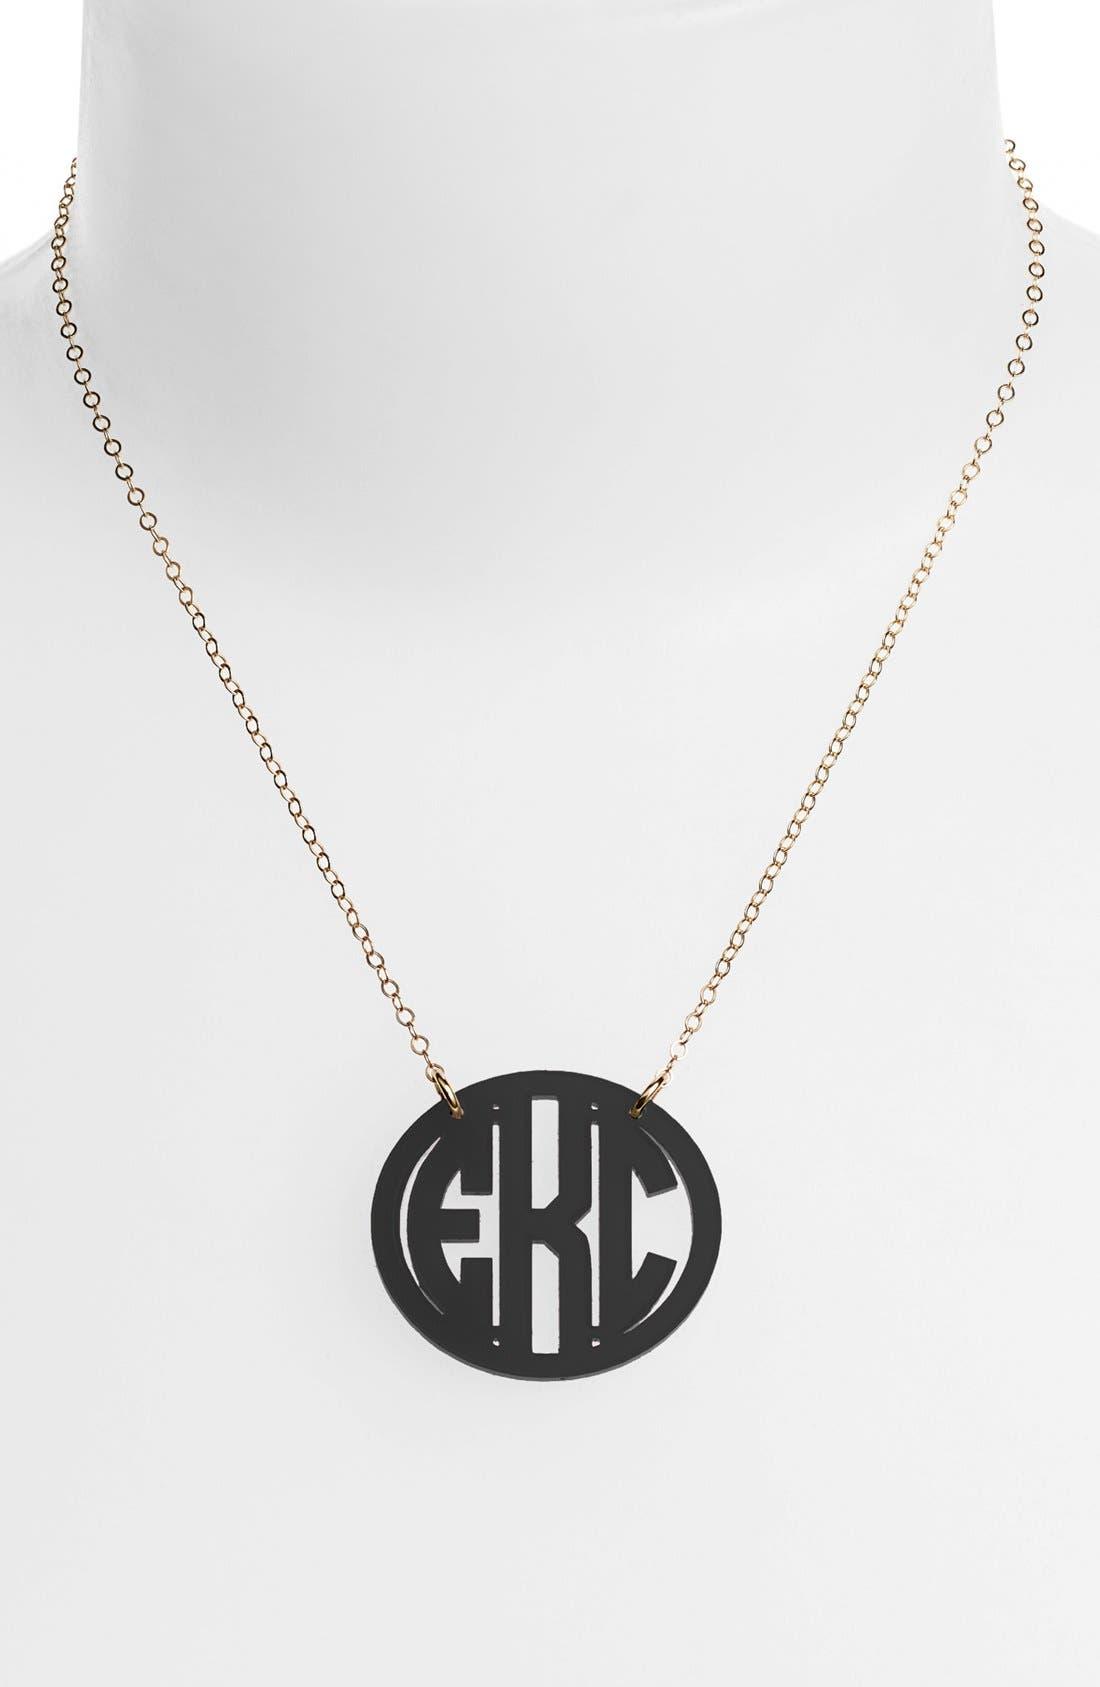 MOON AND LOLA, Medium Oval Personalized Monogram Pendant Necklace, Main thumbnail 1, color, EBONY/ GOLD